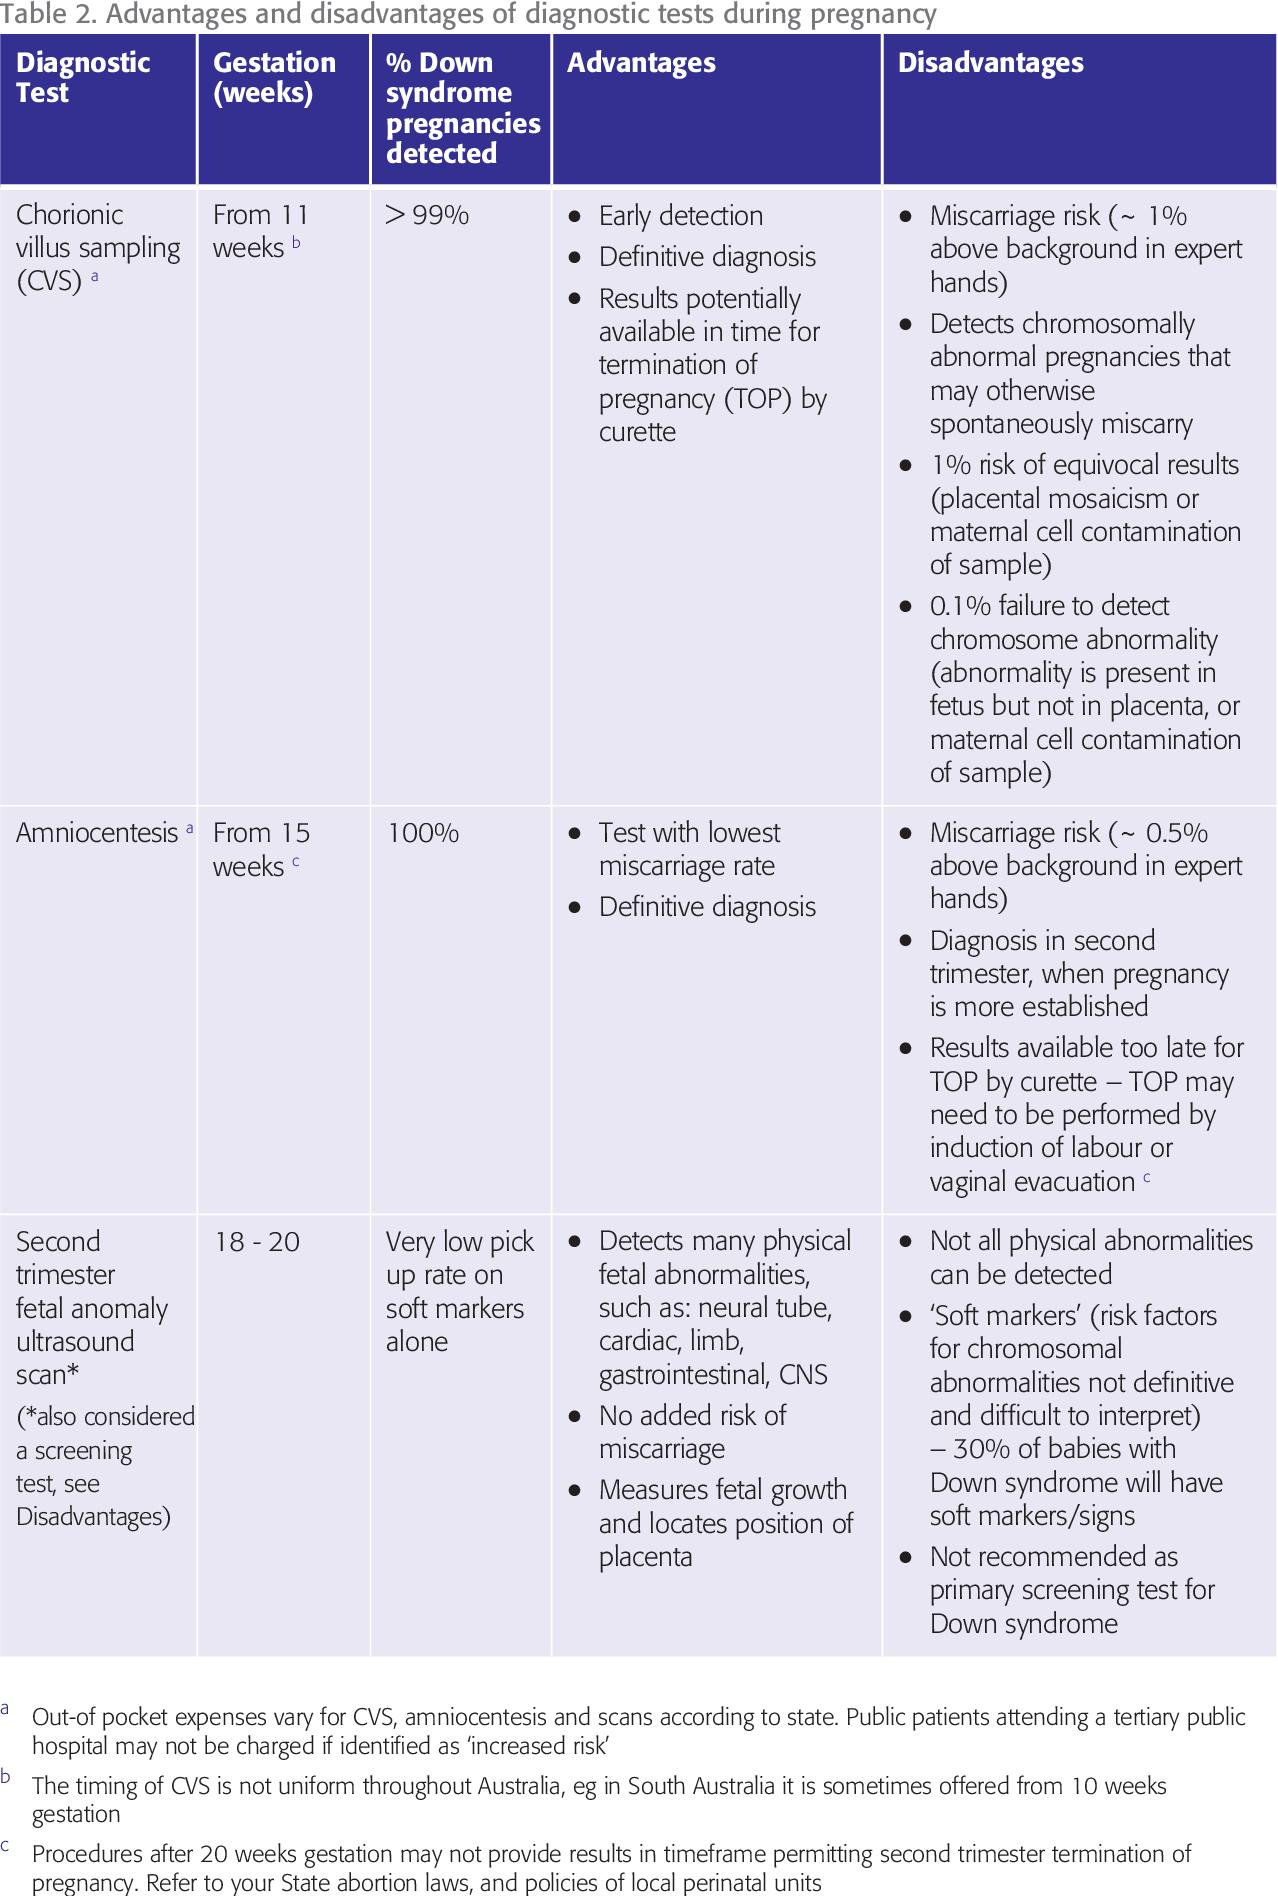 PDF] Genetics in Family Medicine: The Australian Handbook for